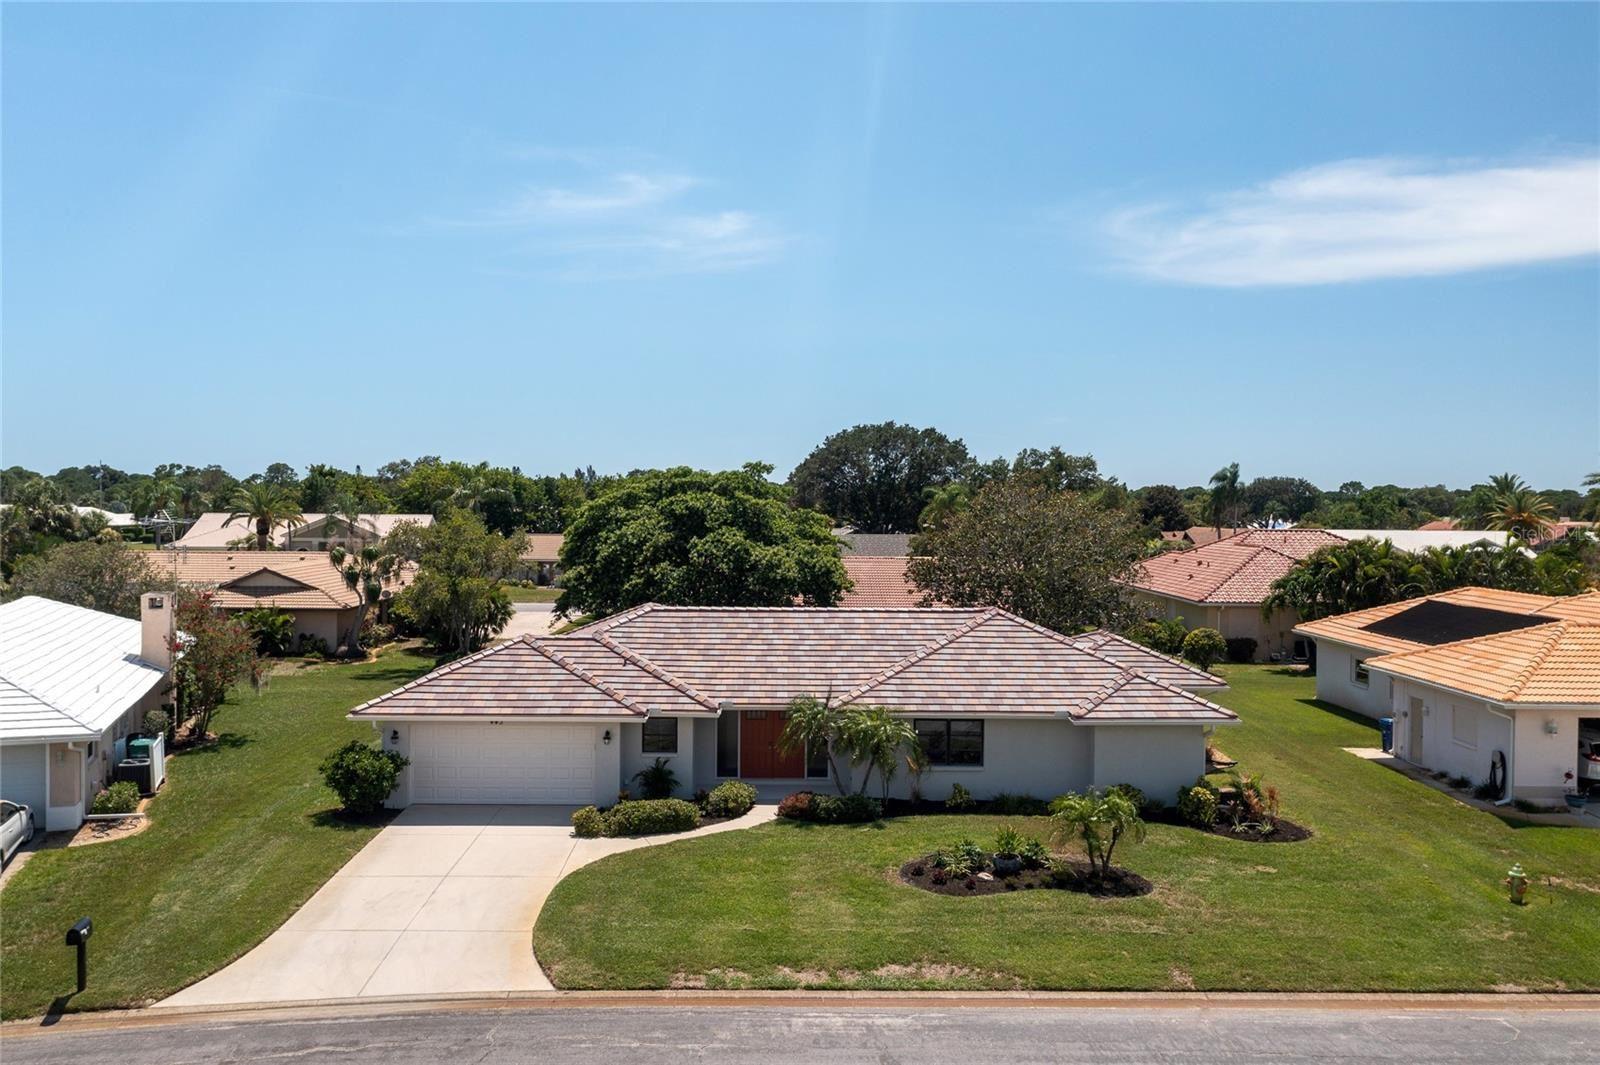 Photo of 443 FIRETHORN AVENUE, ENGLEWOOD, FL 34223 (MLS # D6120203)